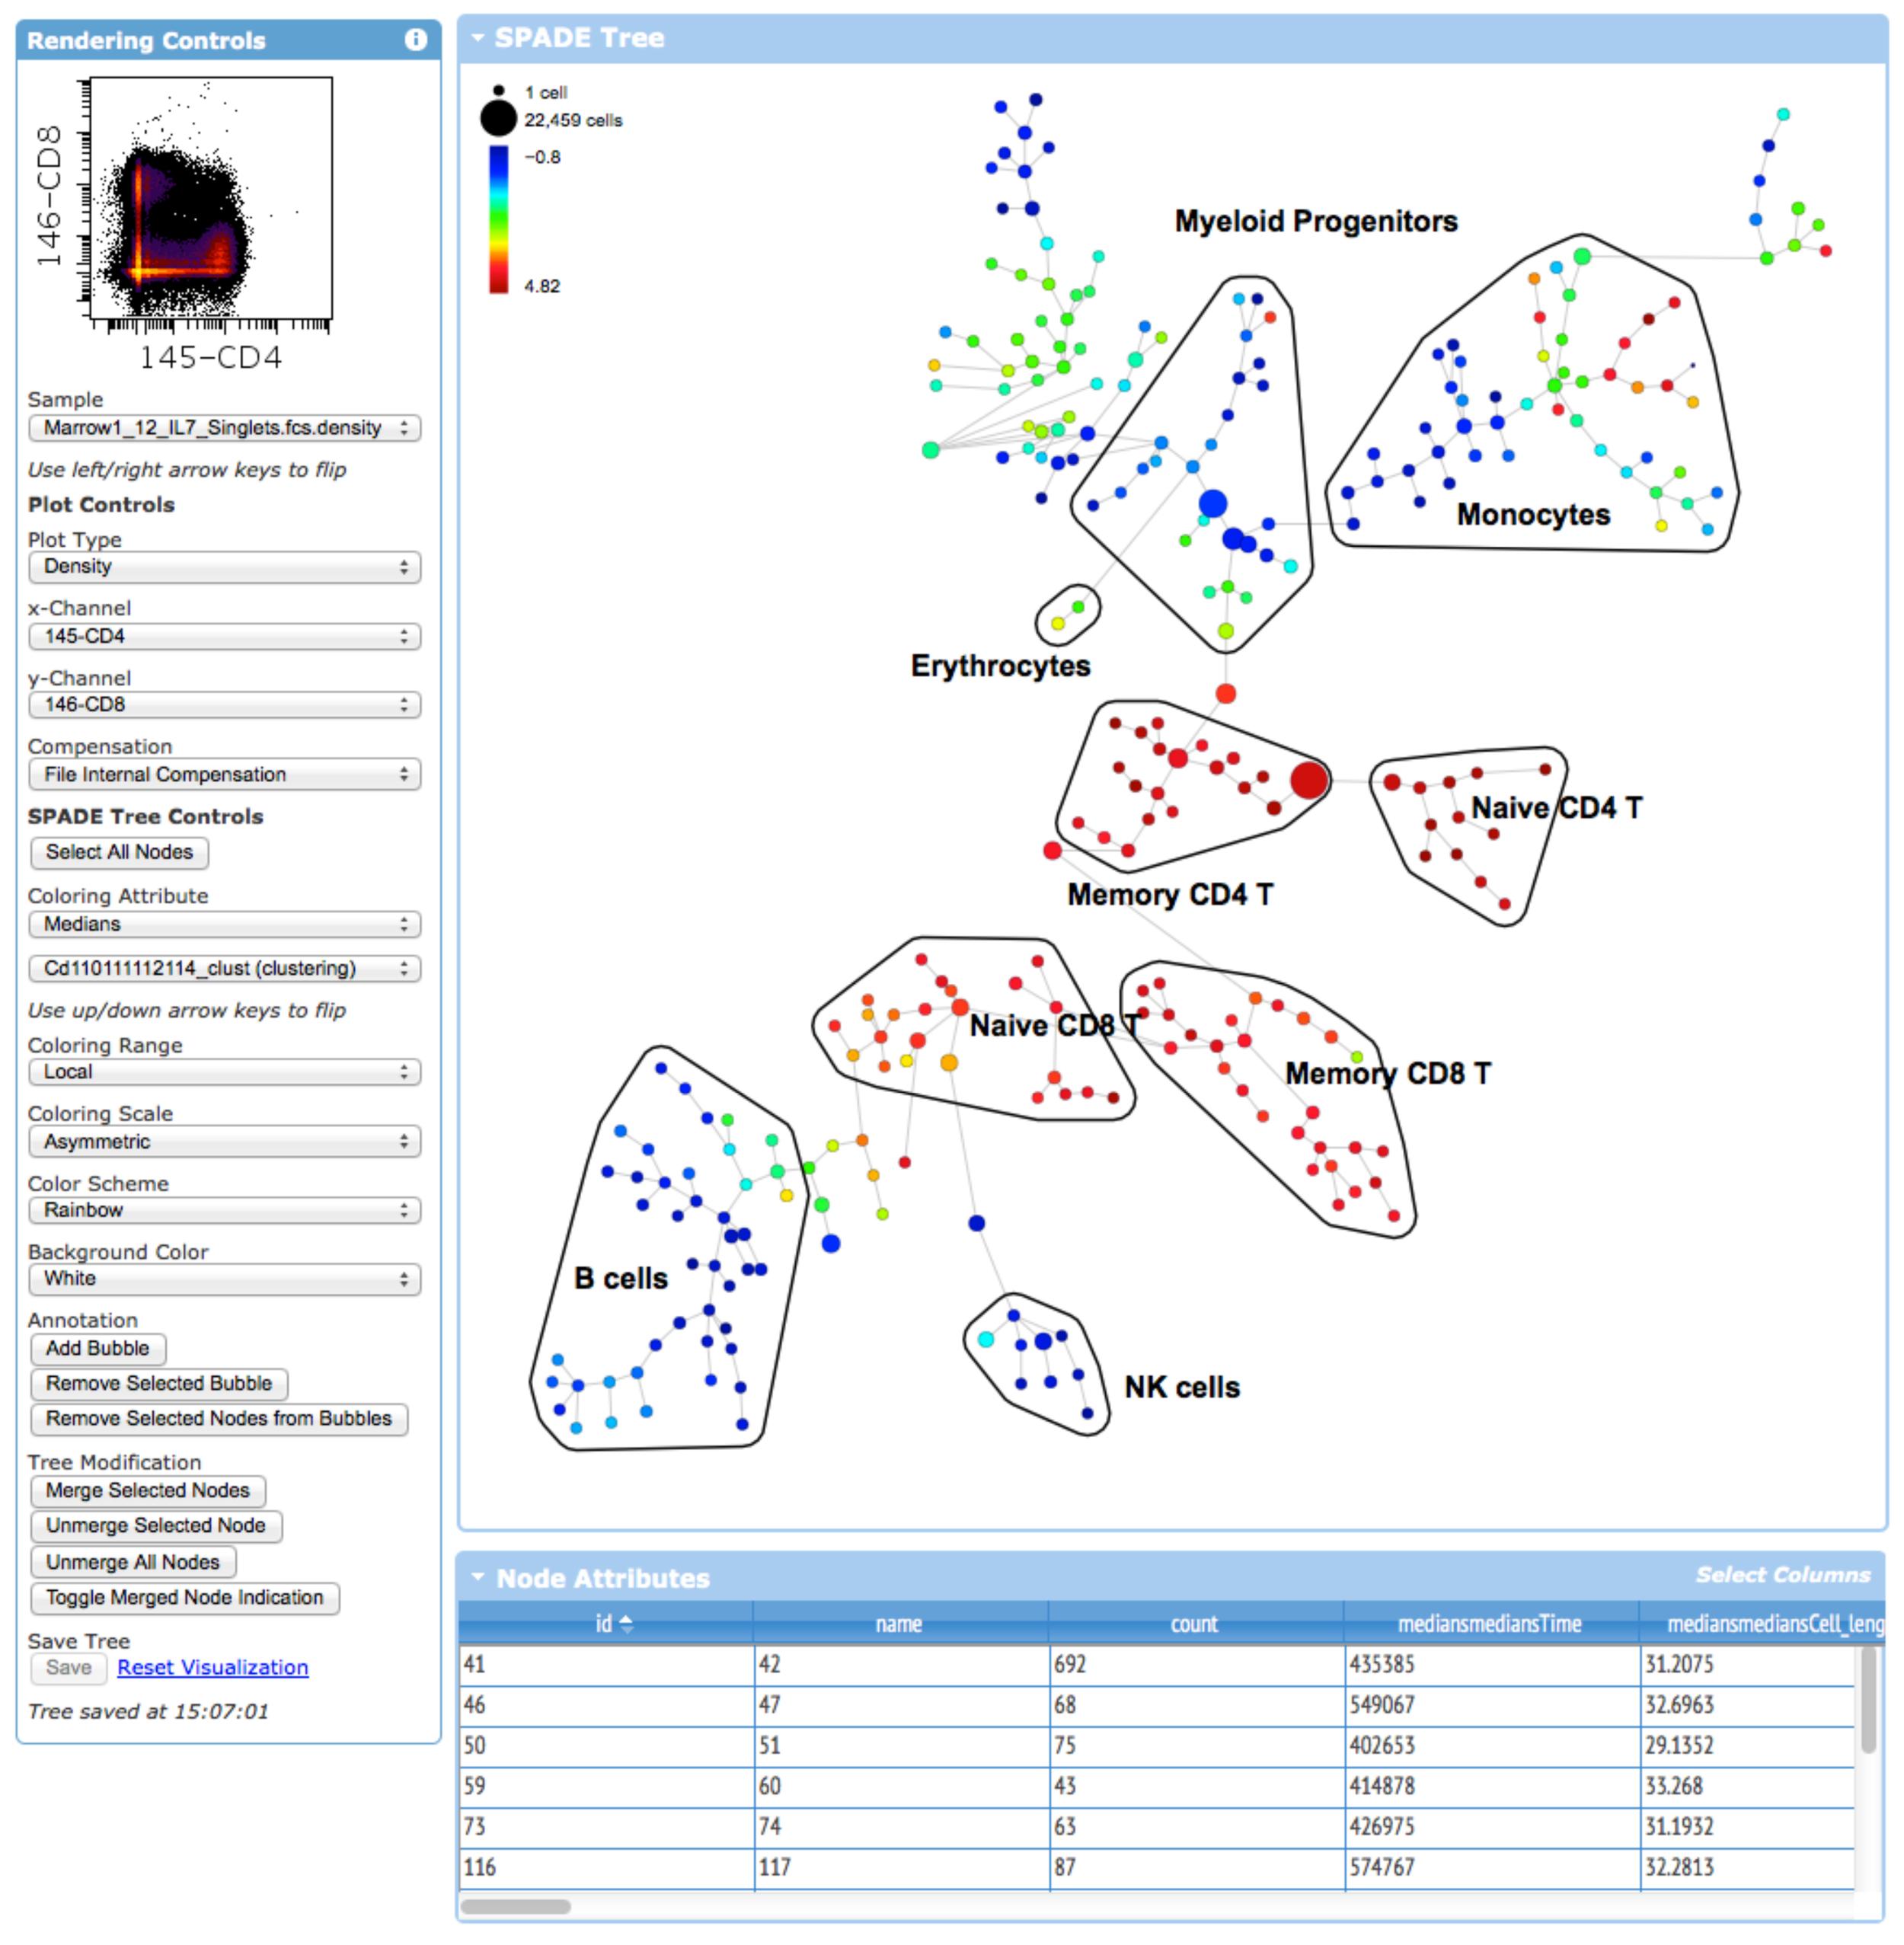 HTML5 SPADE analysis tool in Cytobank